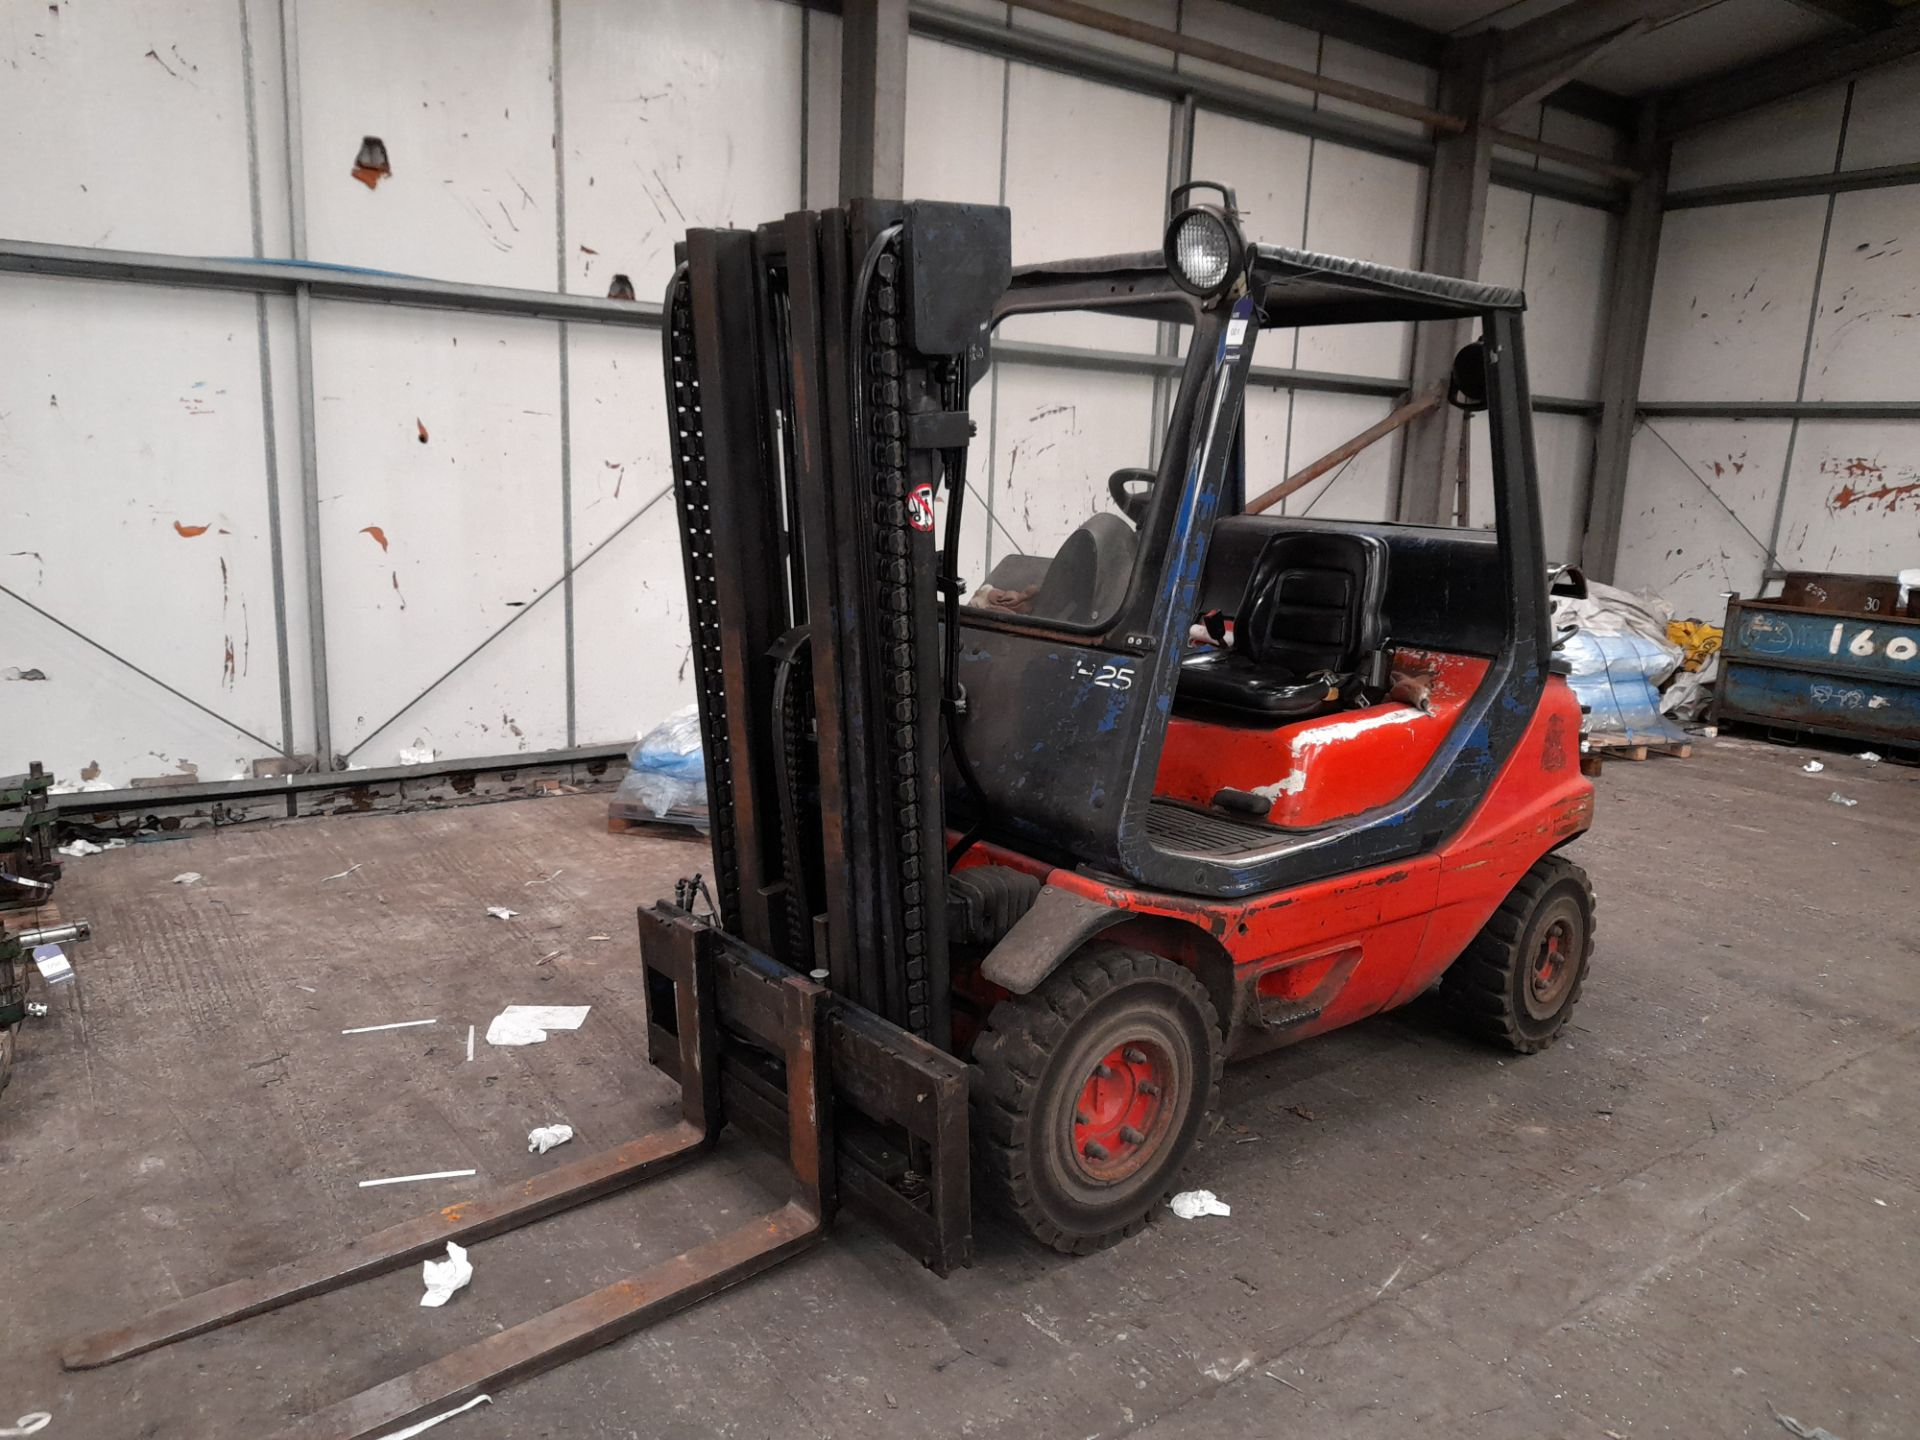 Linde H25T-02 LPG Forklift Truck, 2500kg Capacity, Triple Mast, Side Shift, Lift Height 3925mm,